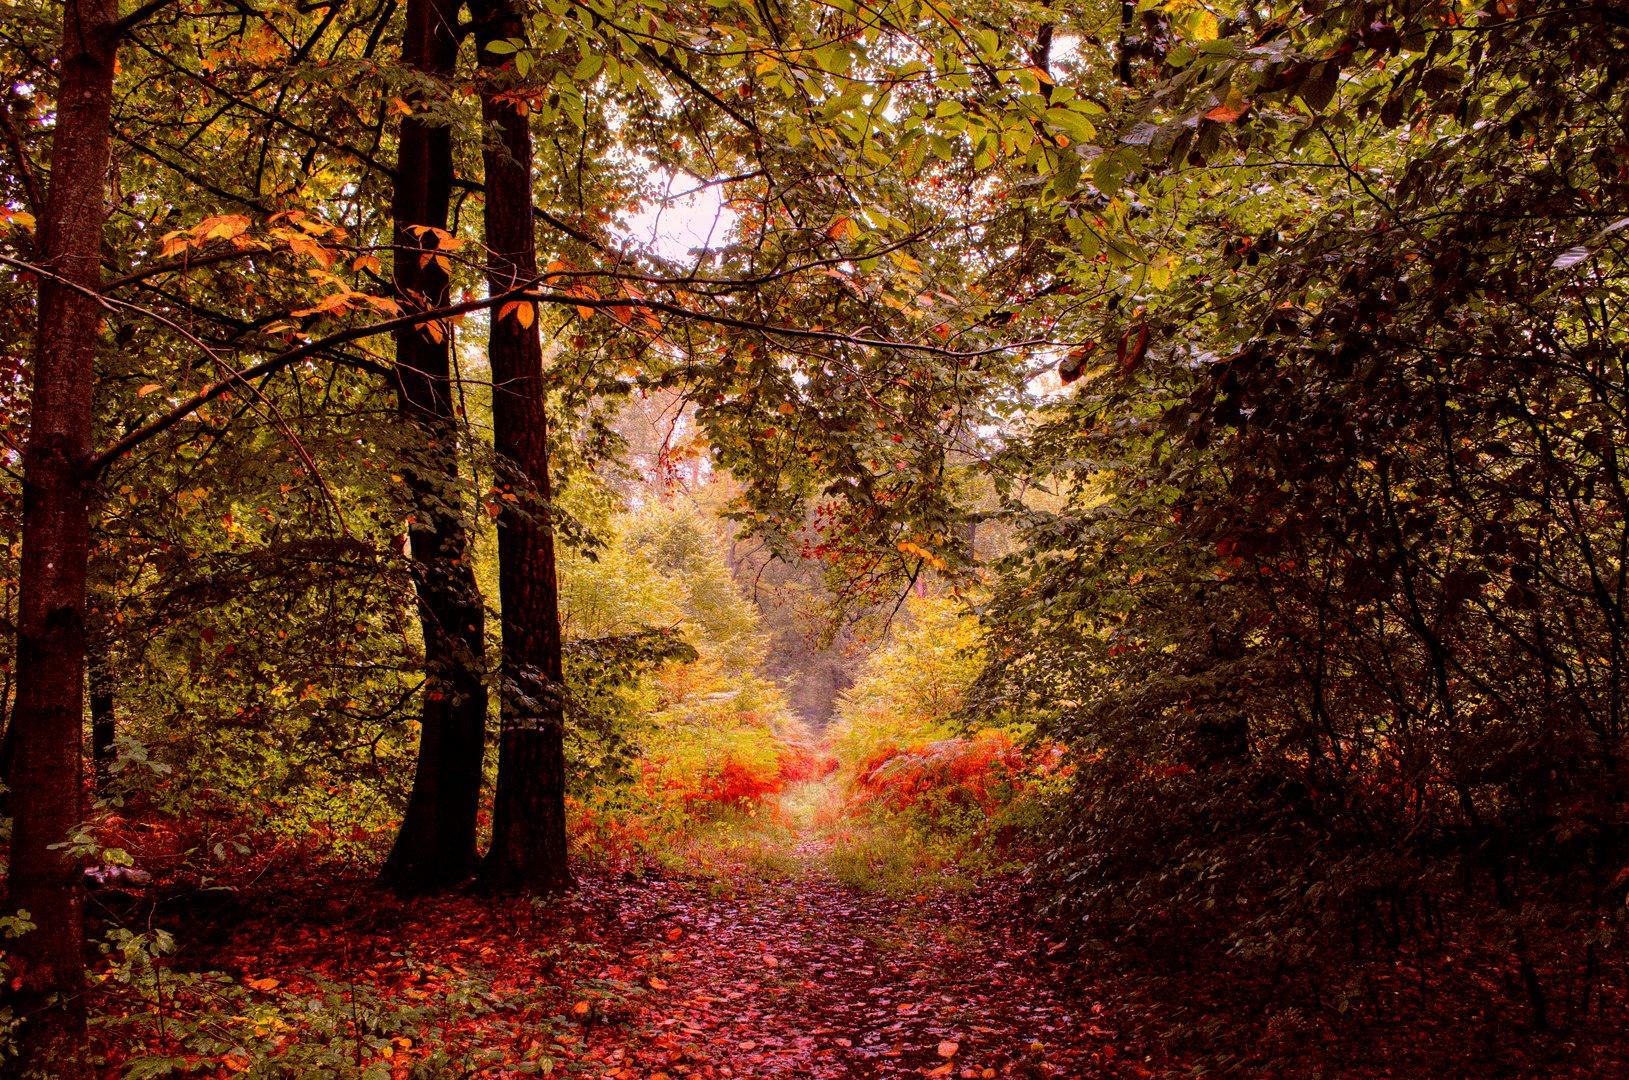 Goldbrauner Herbstwald